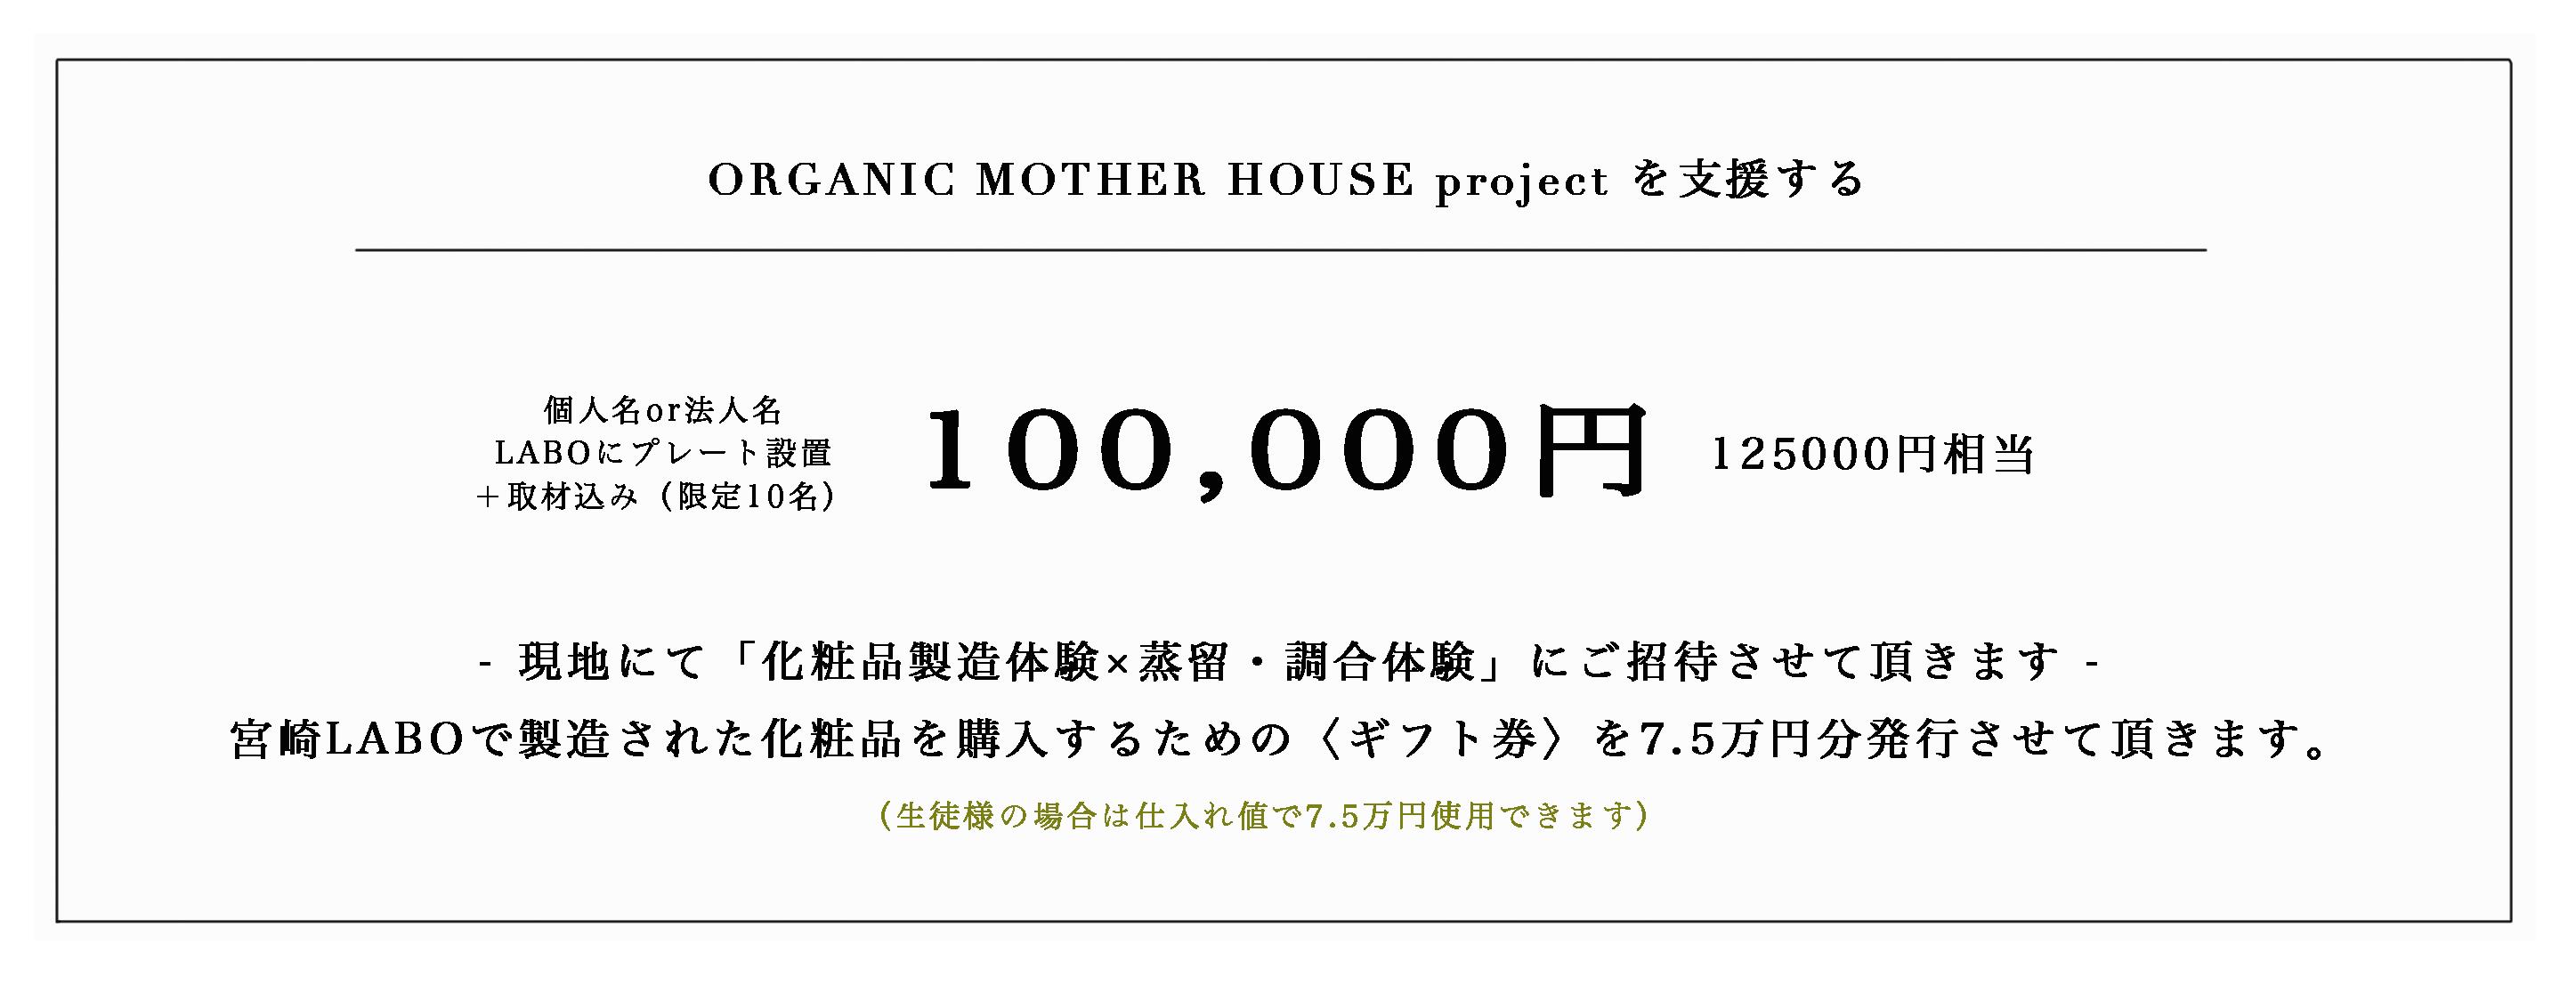 ORGANIC MOTHER HOUSE〈植物調合美容研究所〉10万2